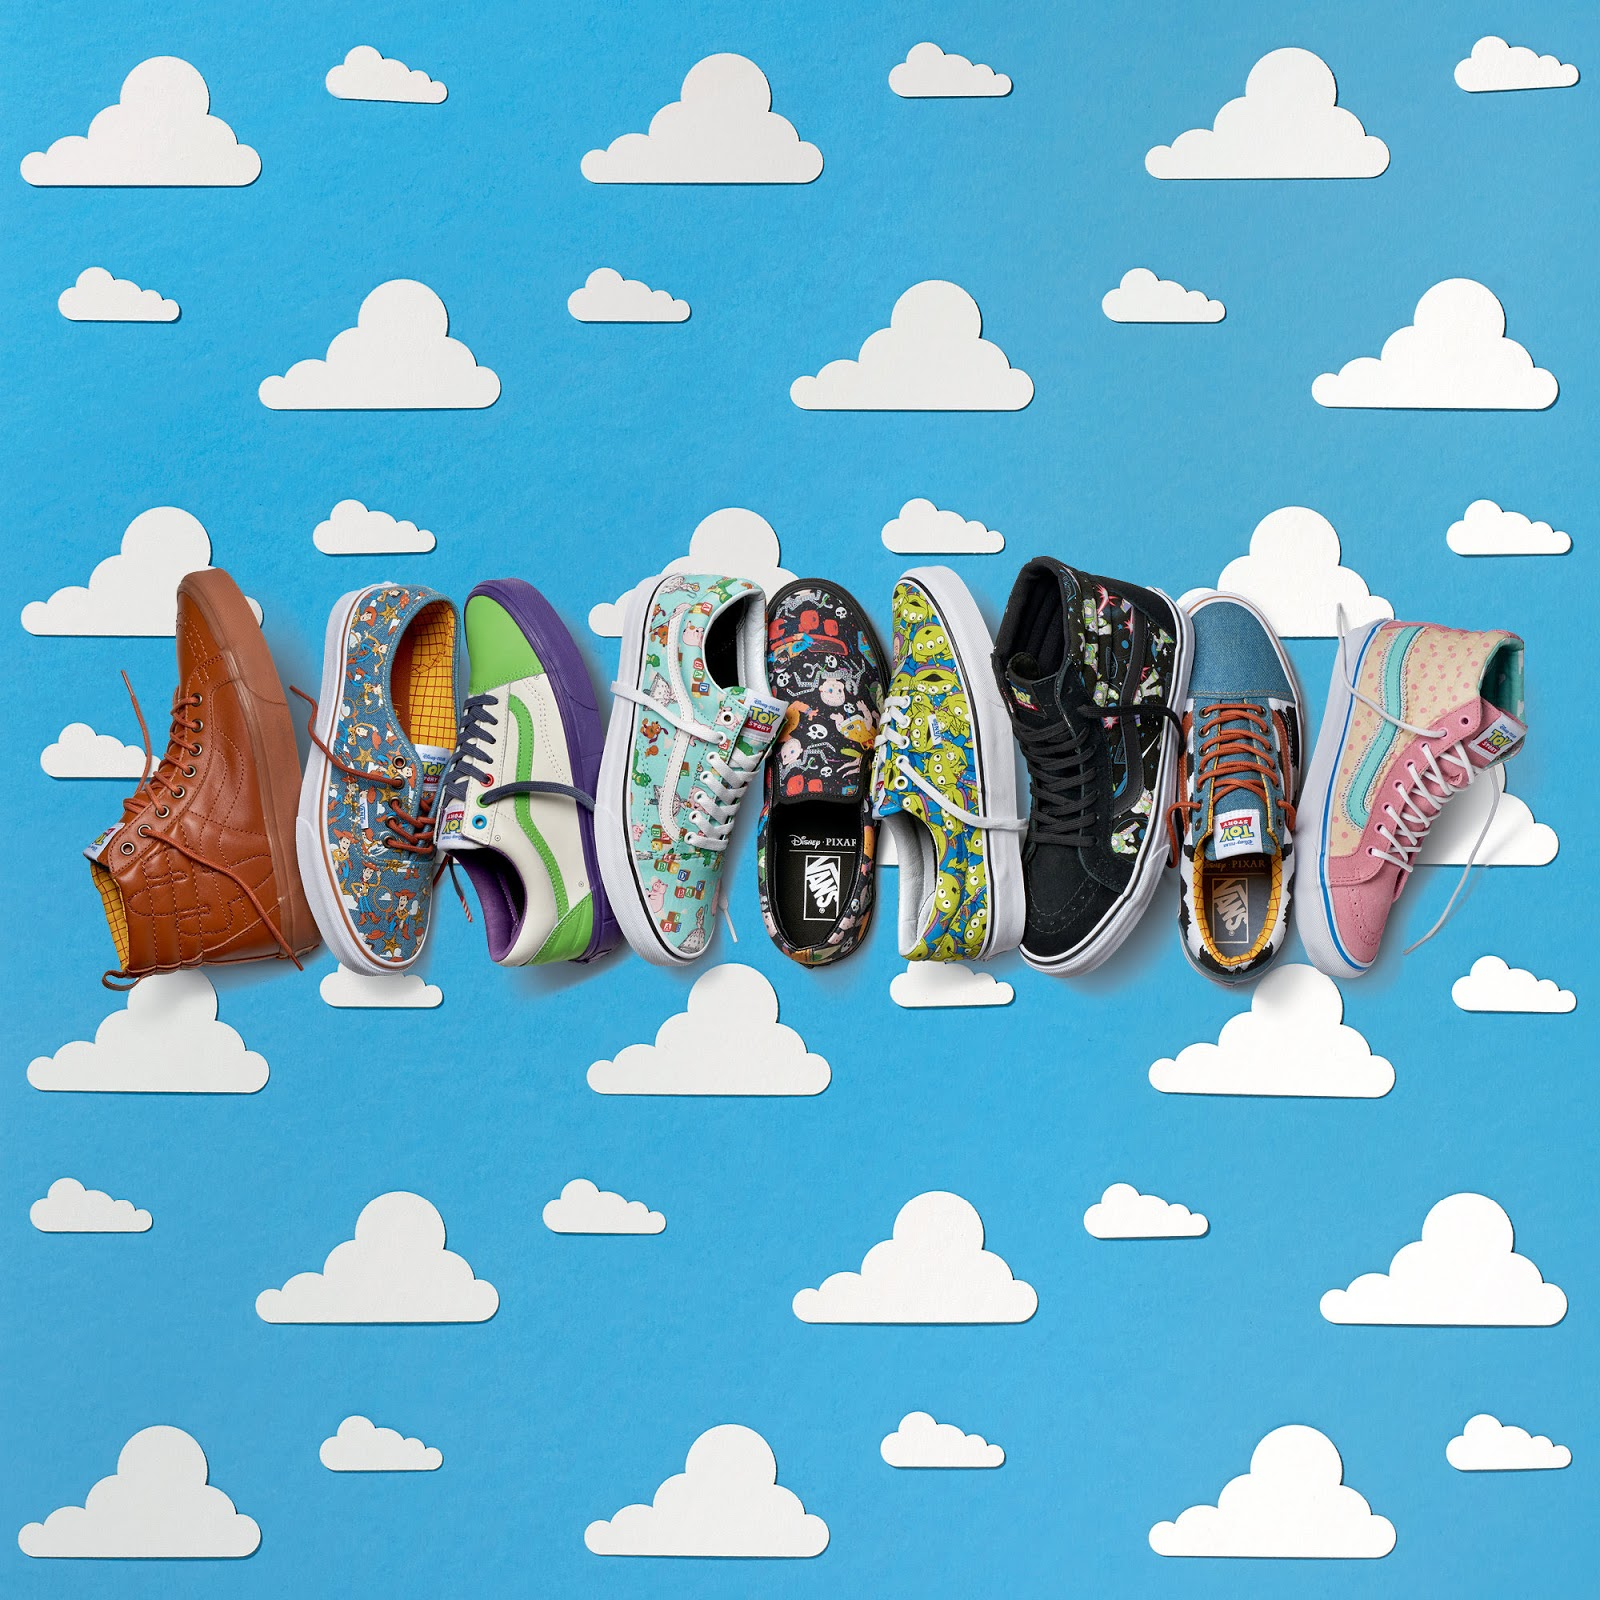 vans-x-toy-story, toy-story-x-vans, pixar-x-vans, vans-toy-story, toy-story-vans, vans-pixar, pixar-vans, Toy-Story-Disney-Pixar, Toy-Story-Disney-Pixar-x-vans, vans-x-pixar, dudessinauxpodiums, du-dessin-aux-podiums